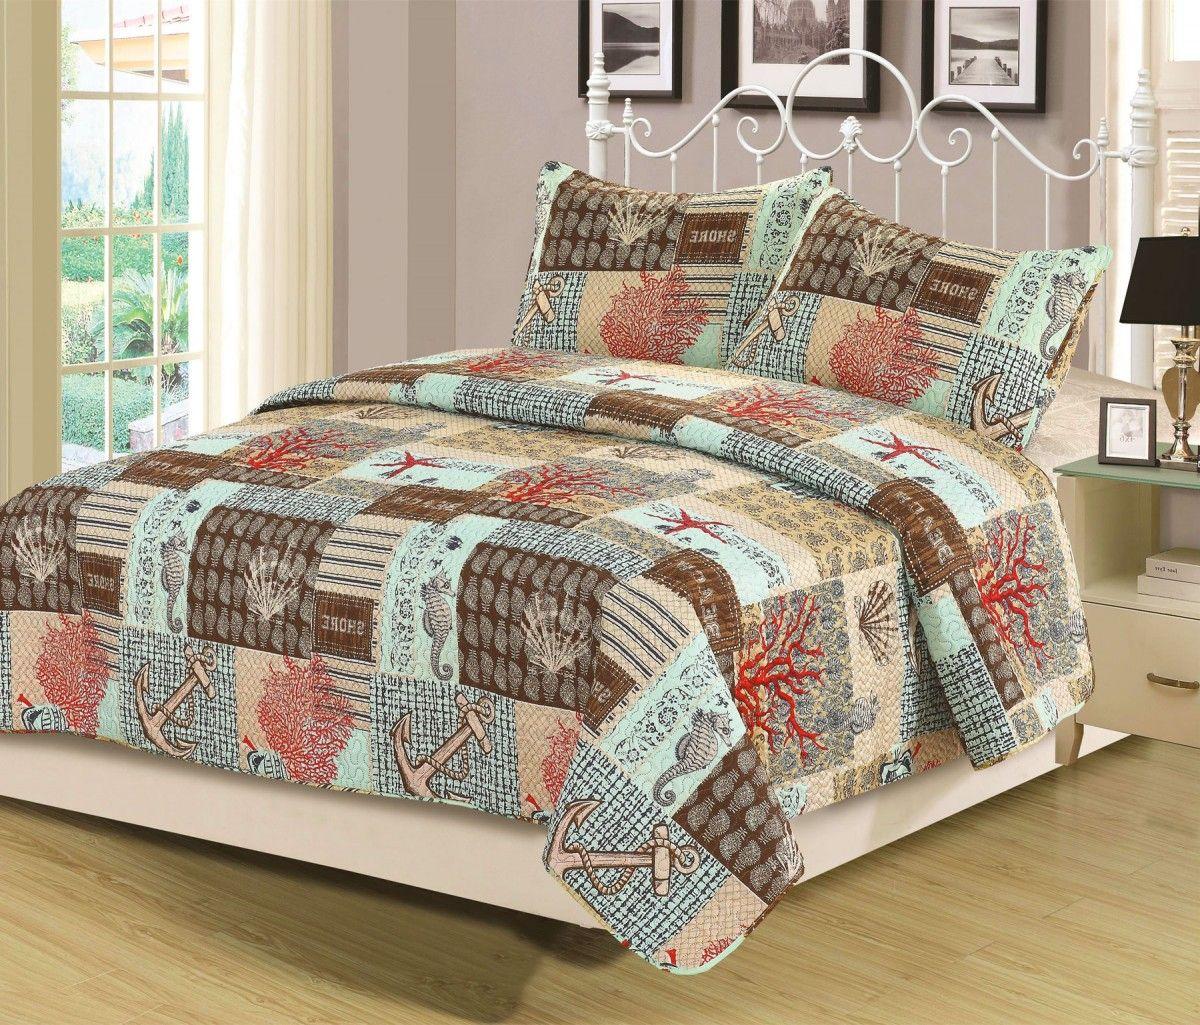 Beatrice Cape May Queen Quilt Set 3 Piece Bedspread